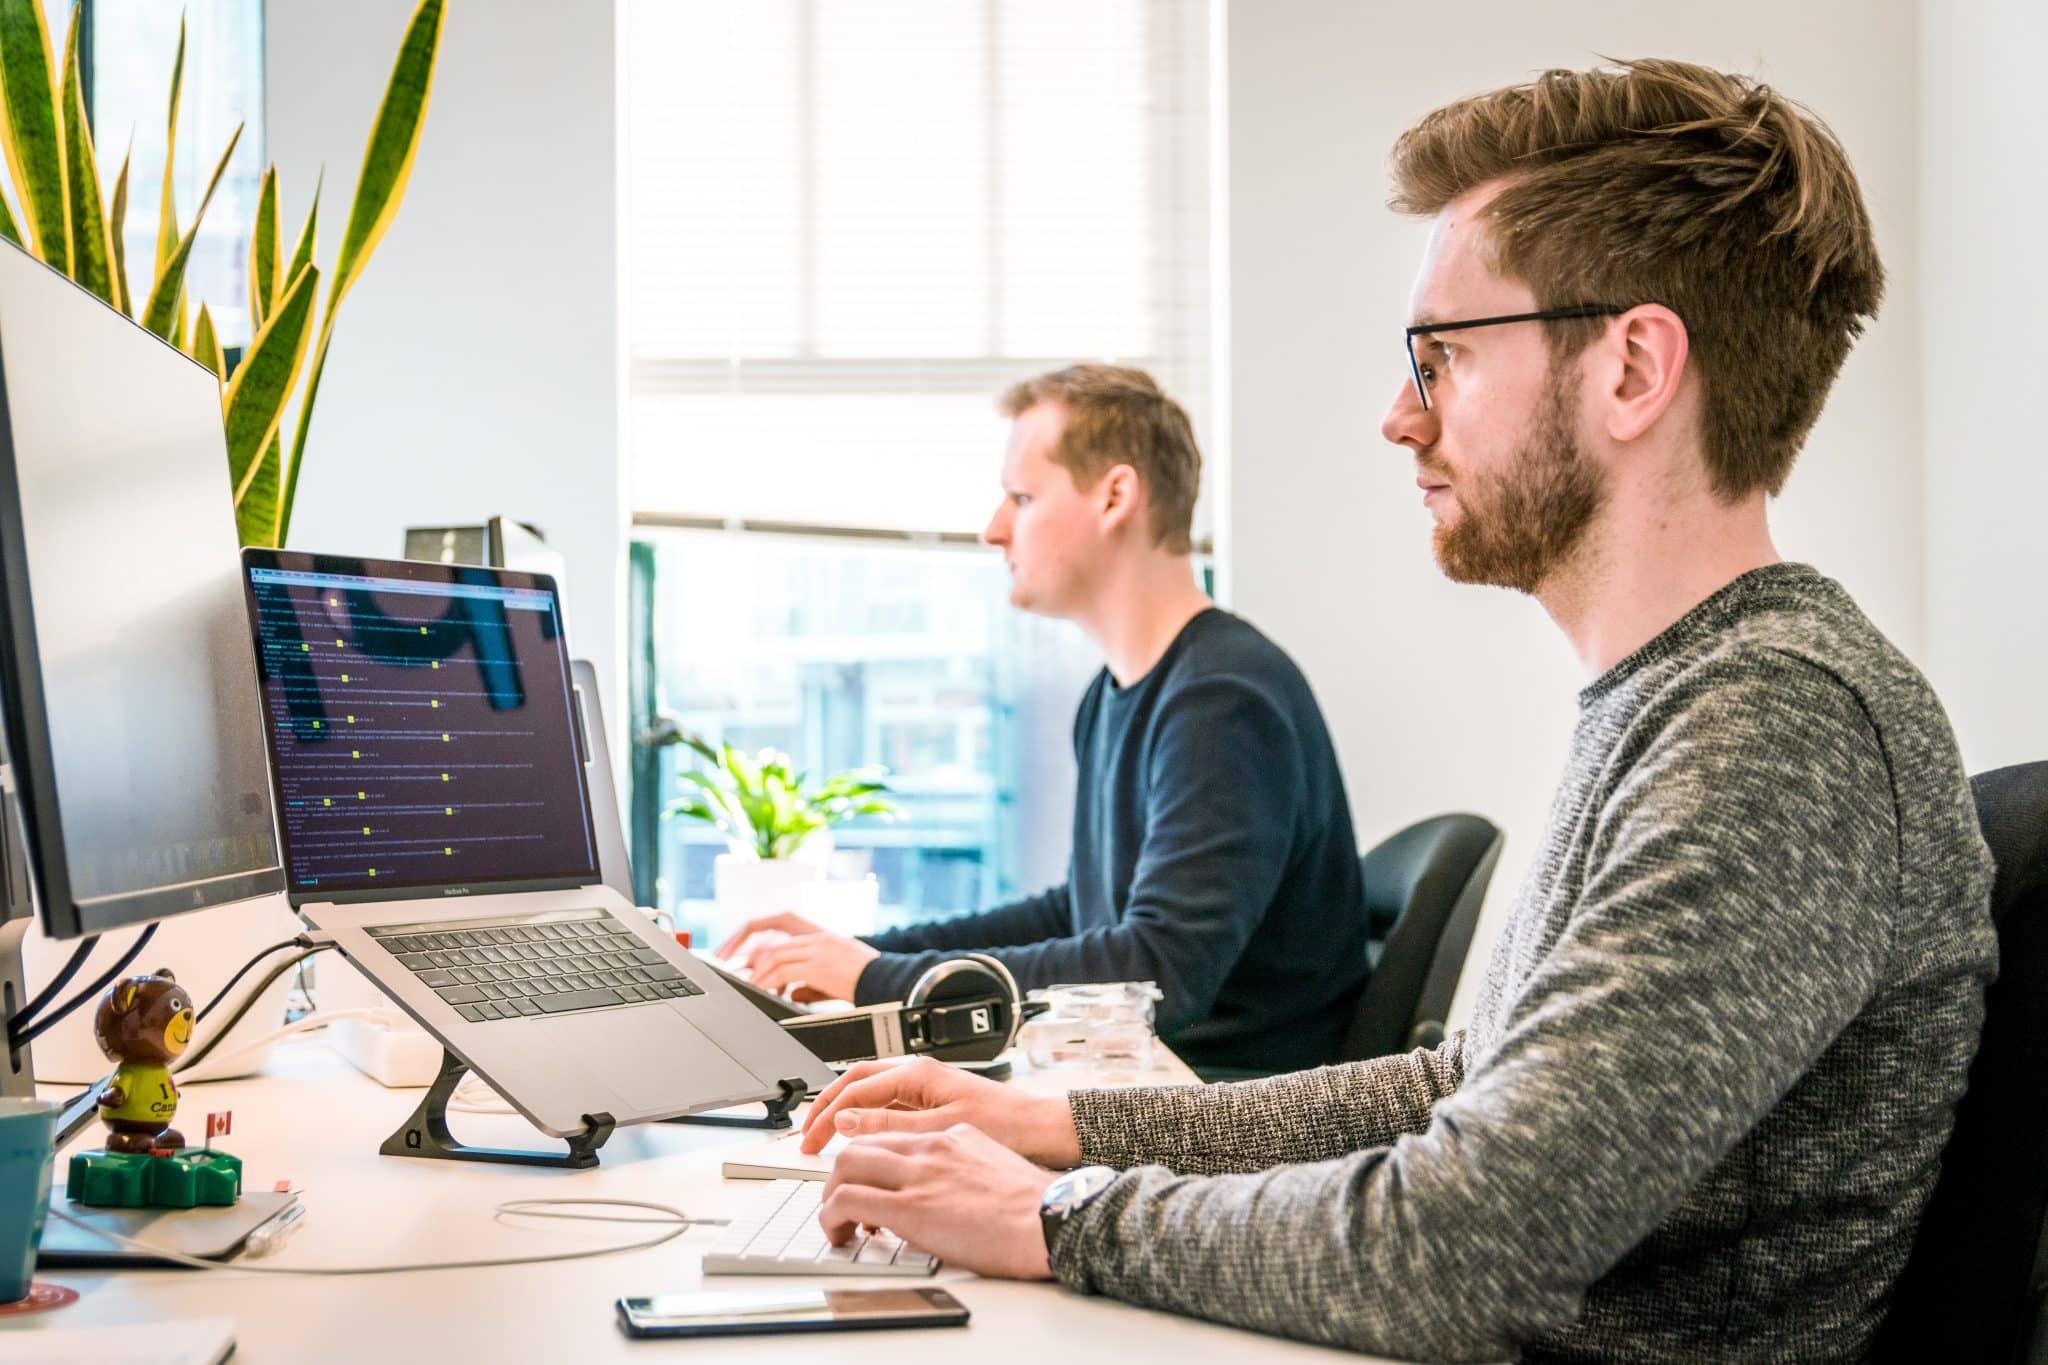 Alyra : devenez développeur blockchain en 10 semaines